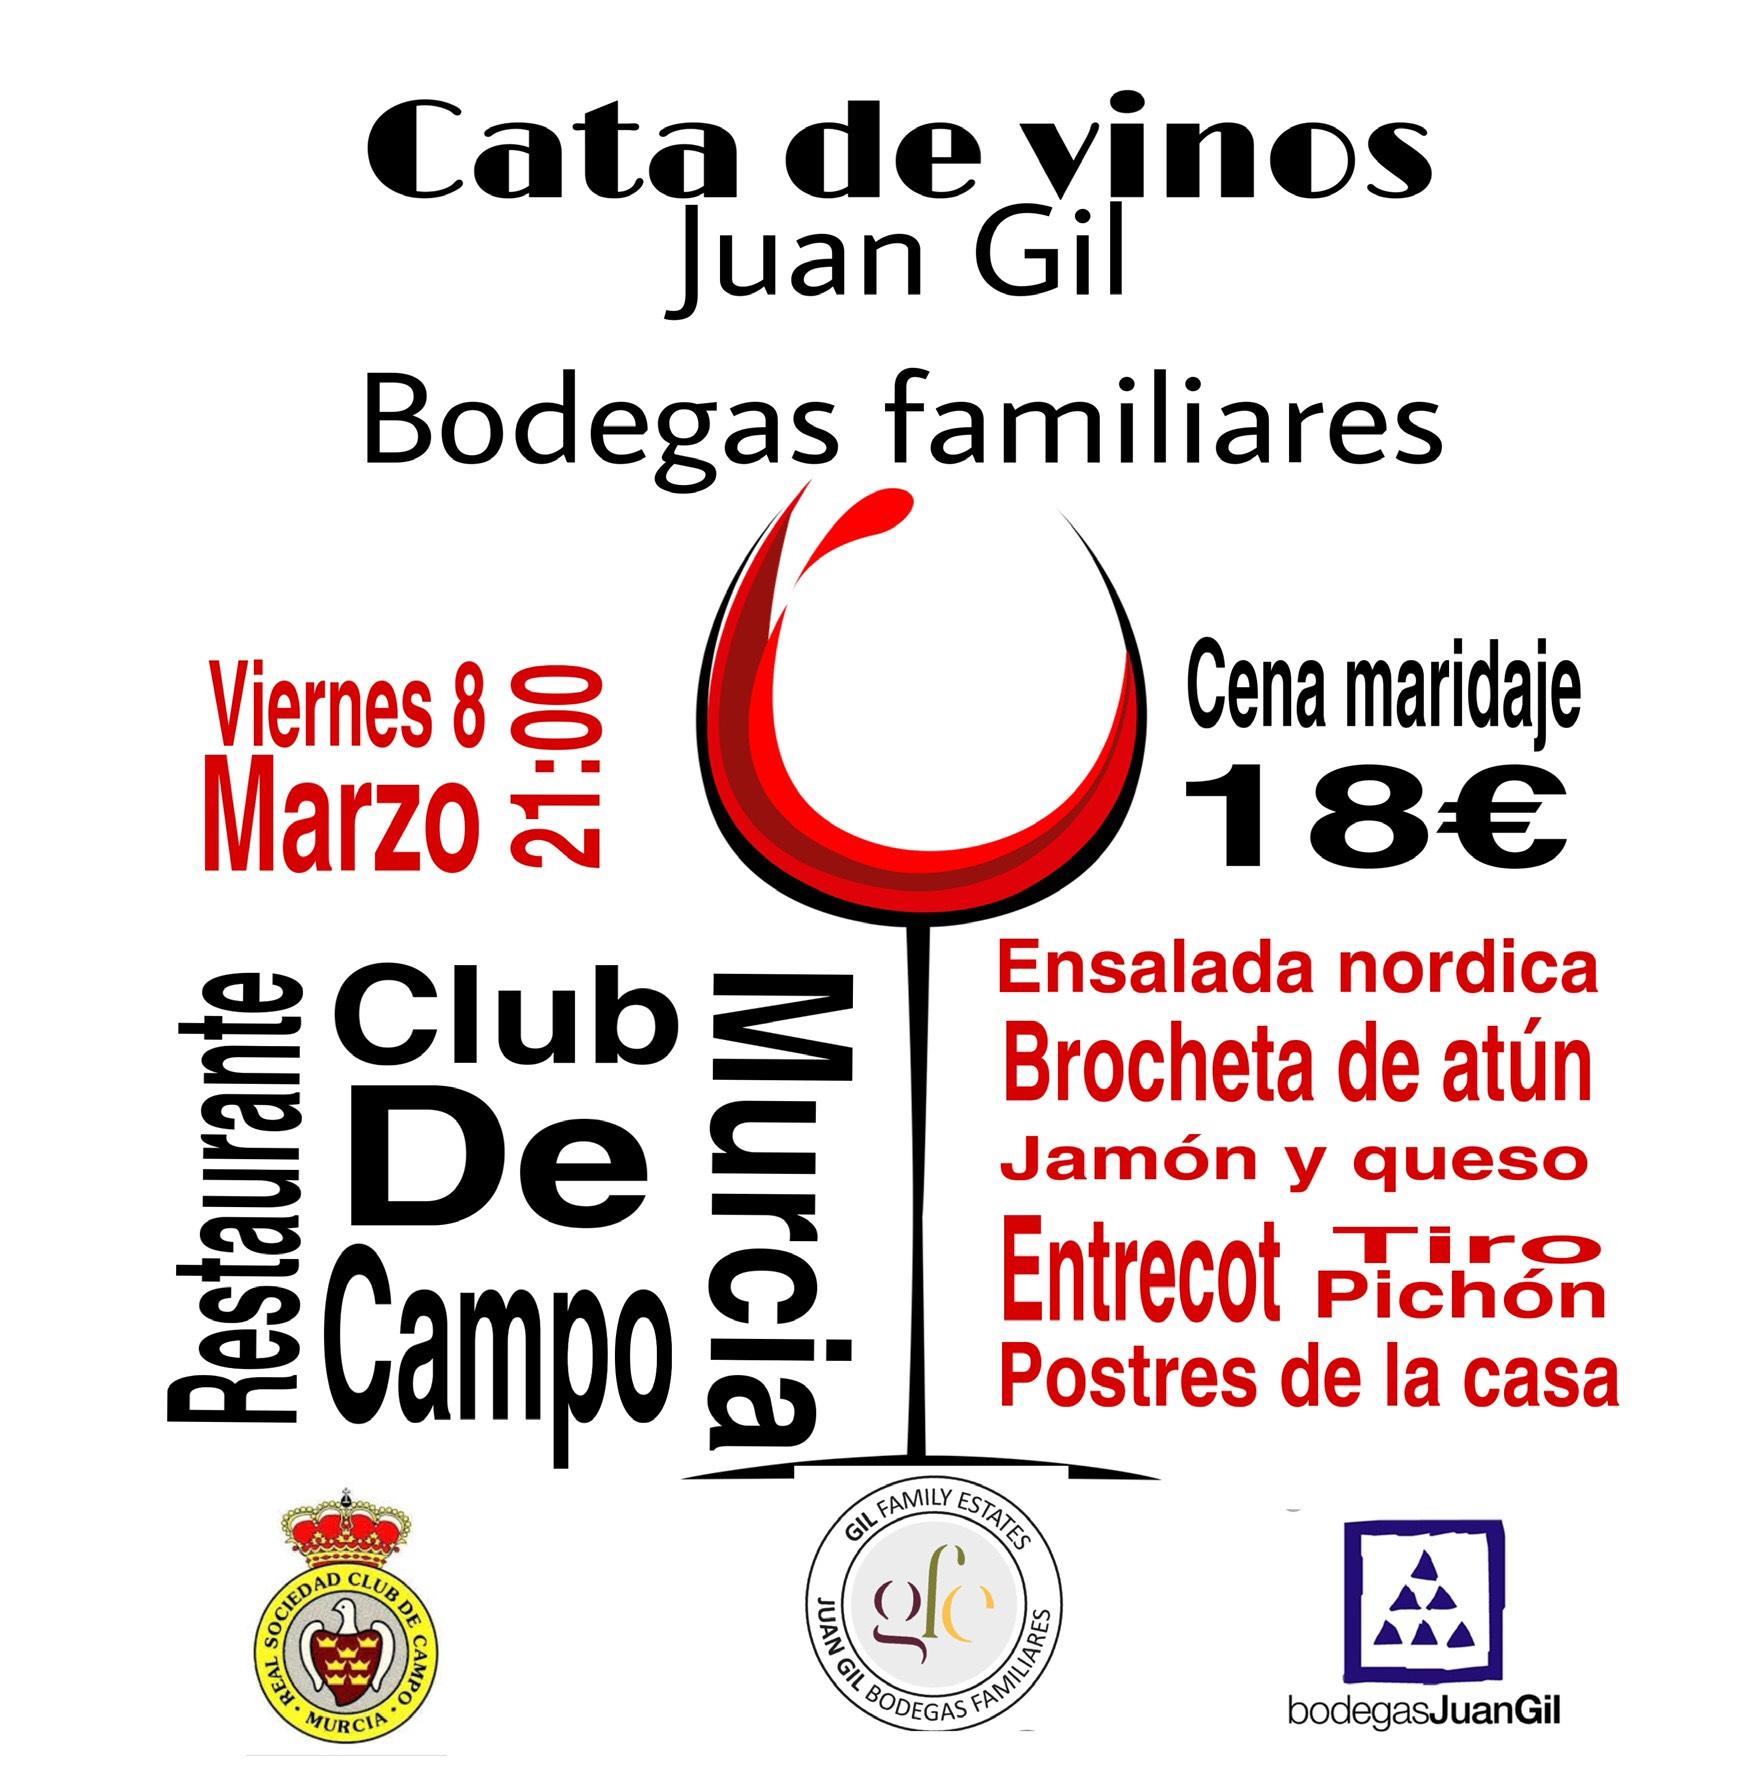 Cata de vinos Juan Gil con maridaje